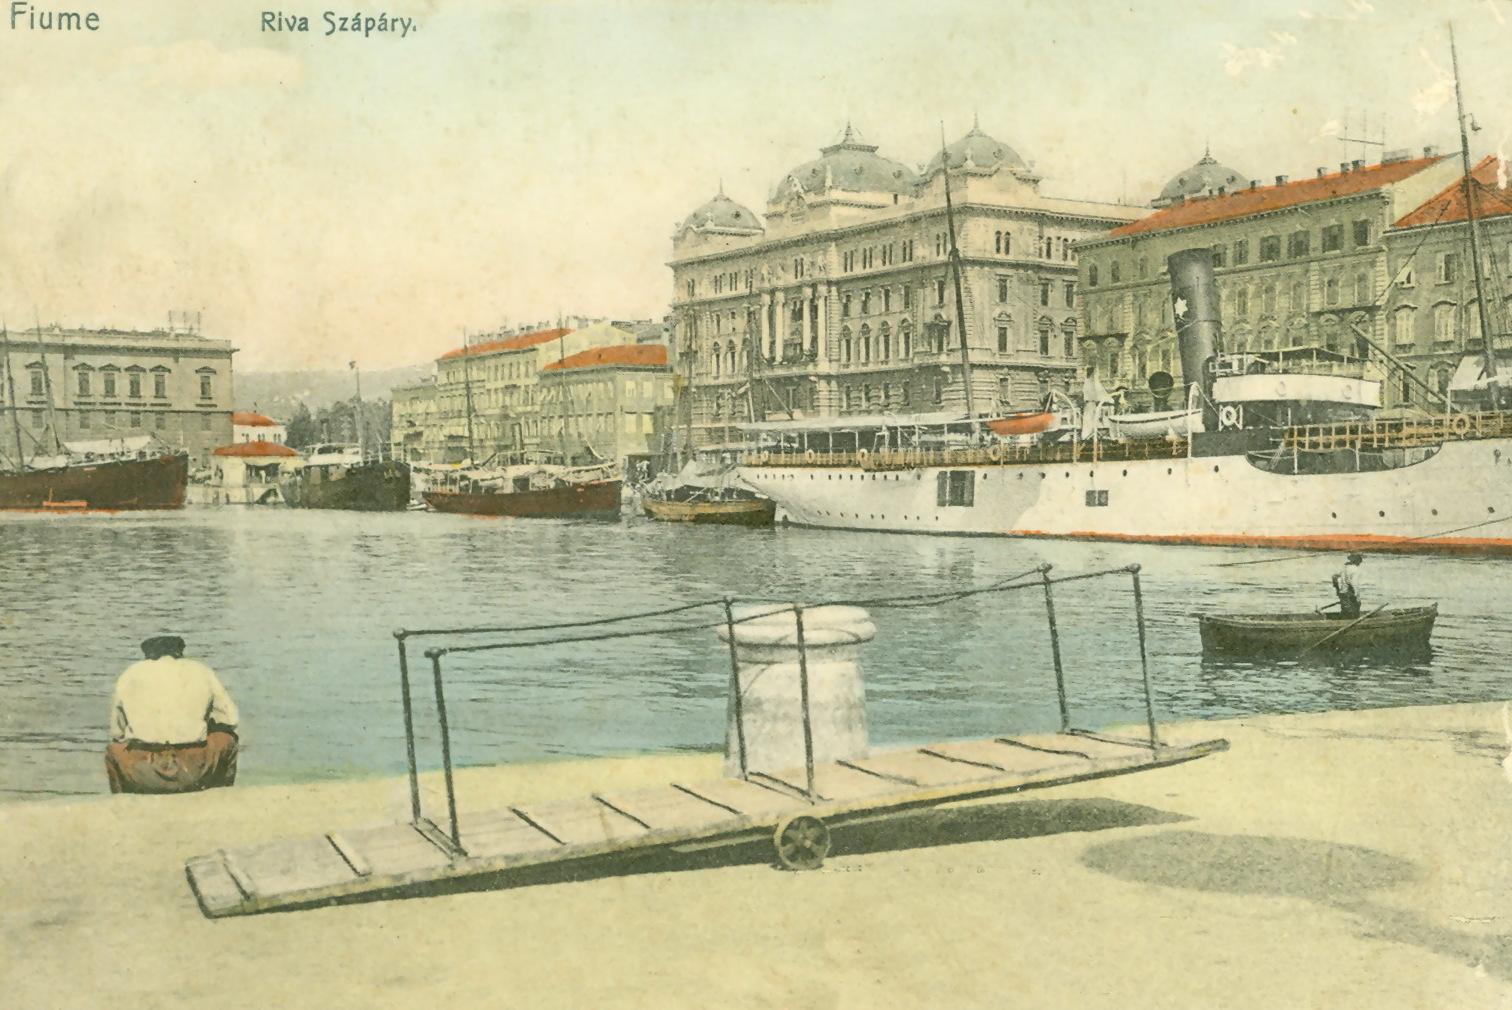 Art color rijeka - File Rijeka Fiume Jpg